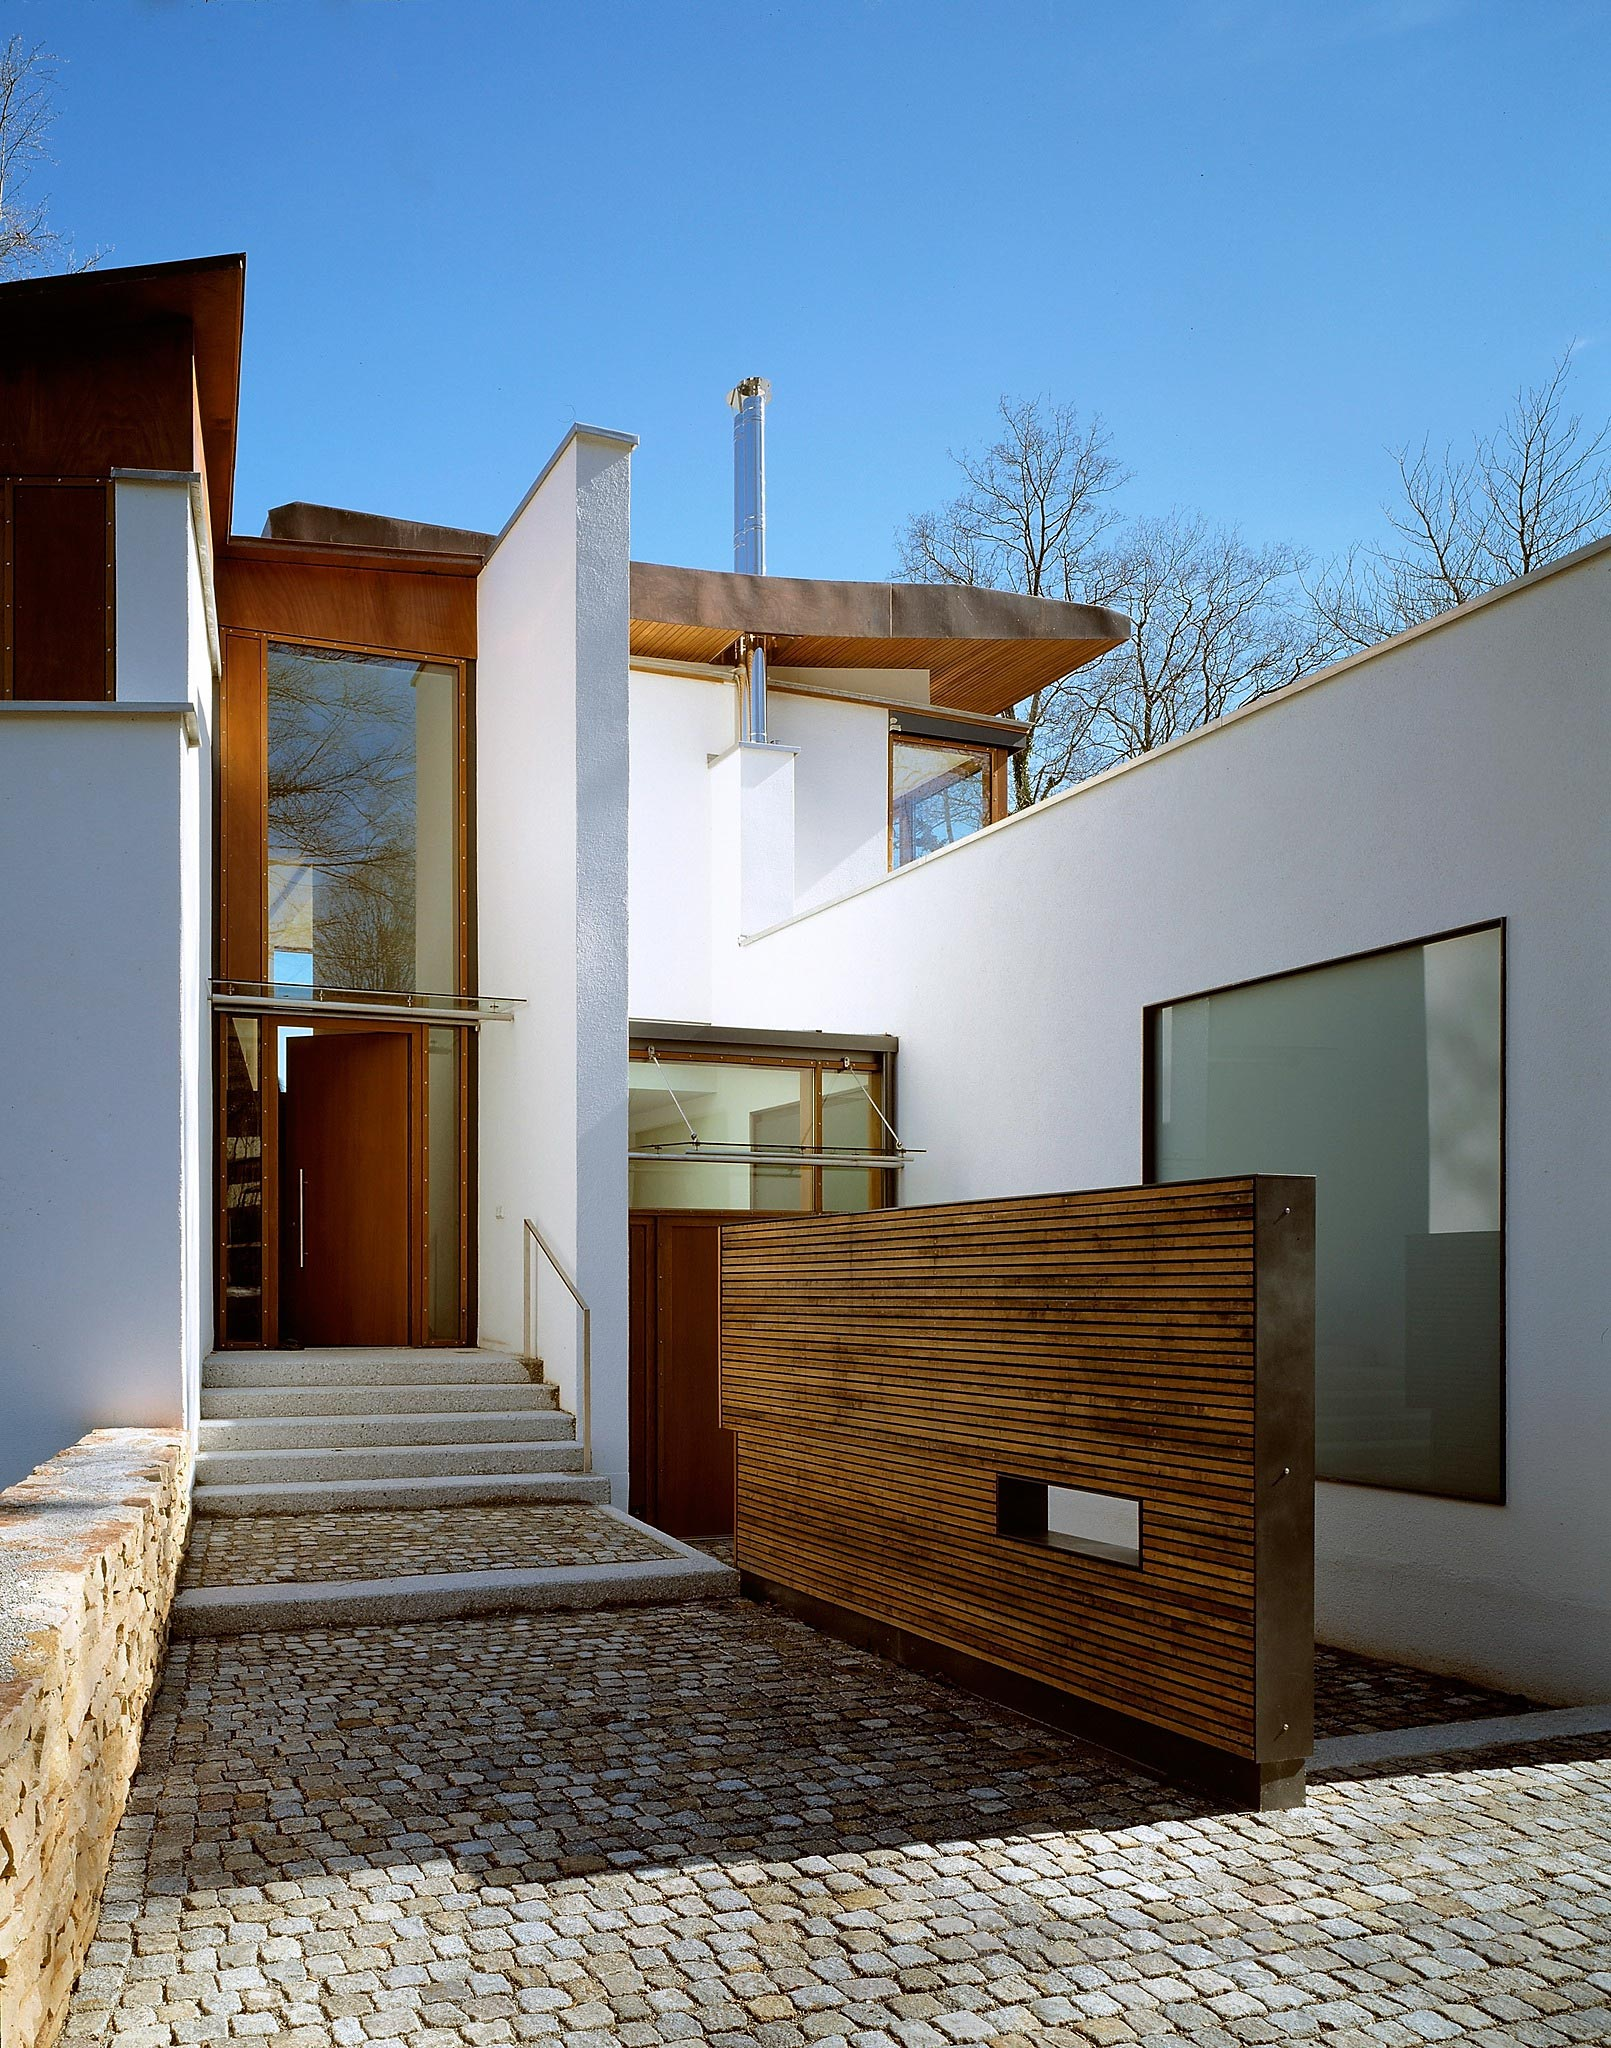 angelo kaunat architektur fotografie. Black Bedroom Furniture Sets. Home Design Ideas